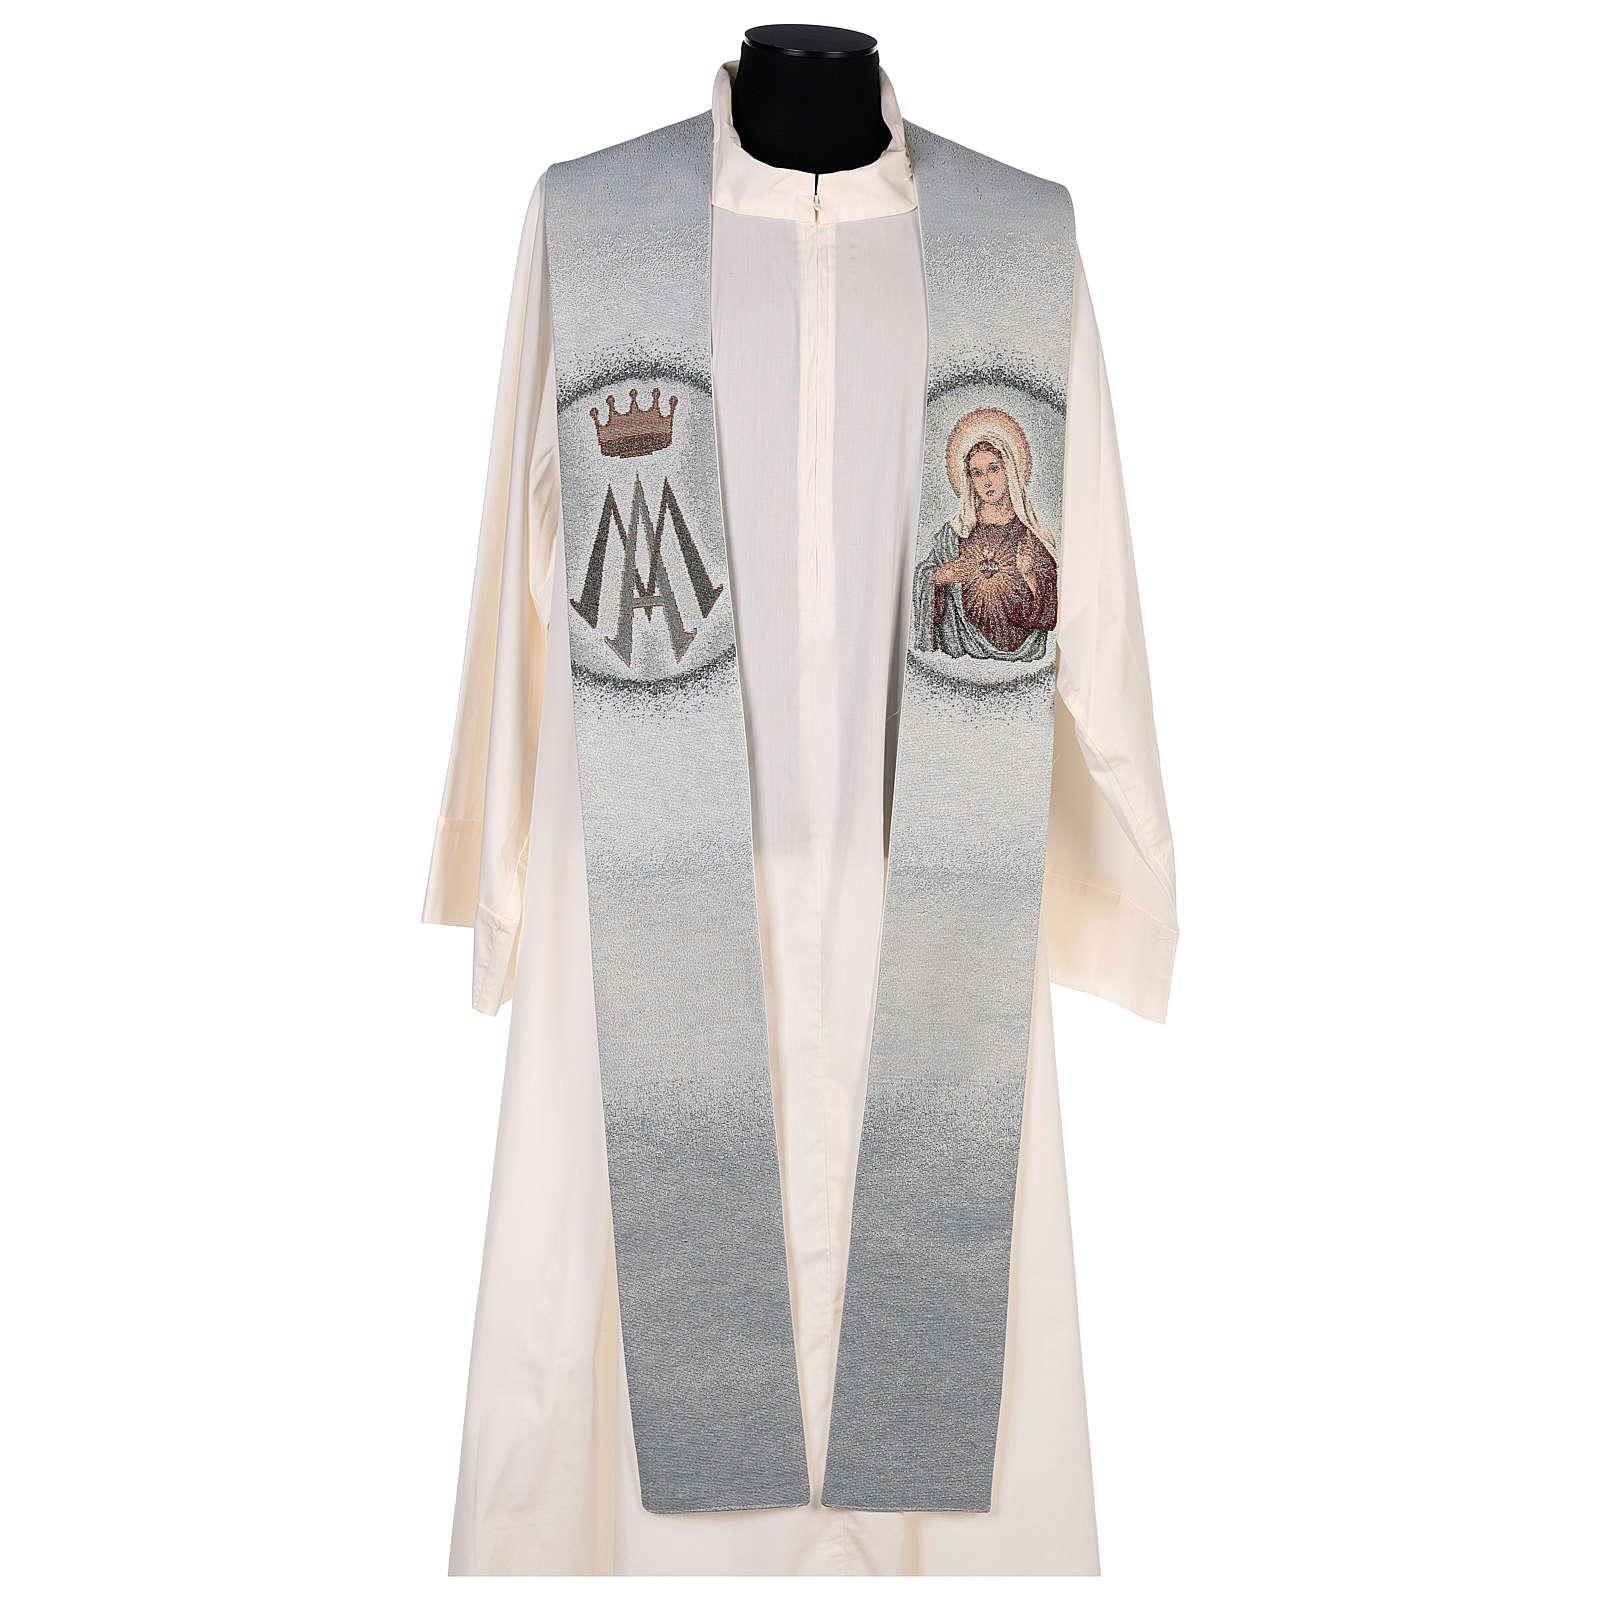 Stola Sacro Cuore di Maria e simbolo mariano 4